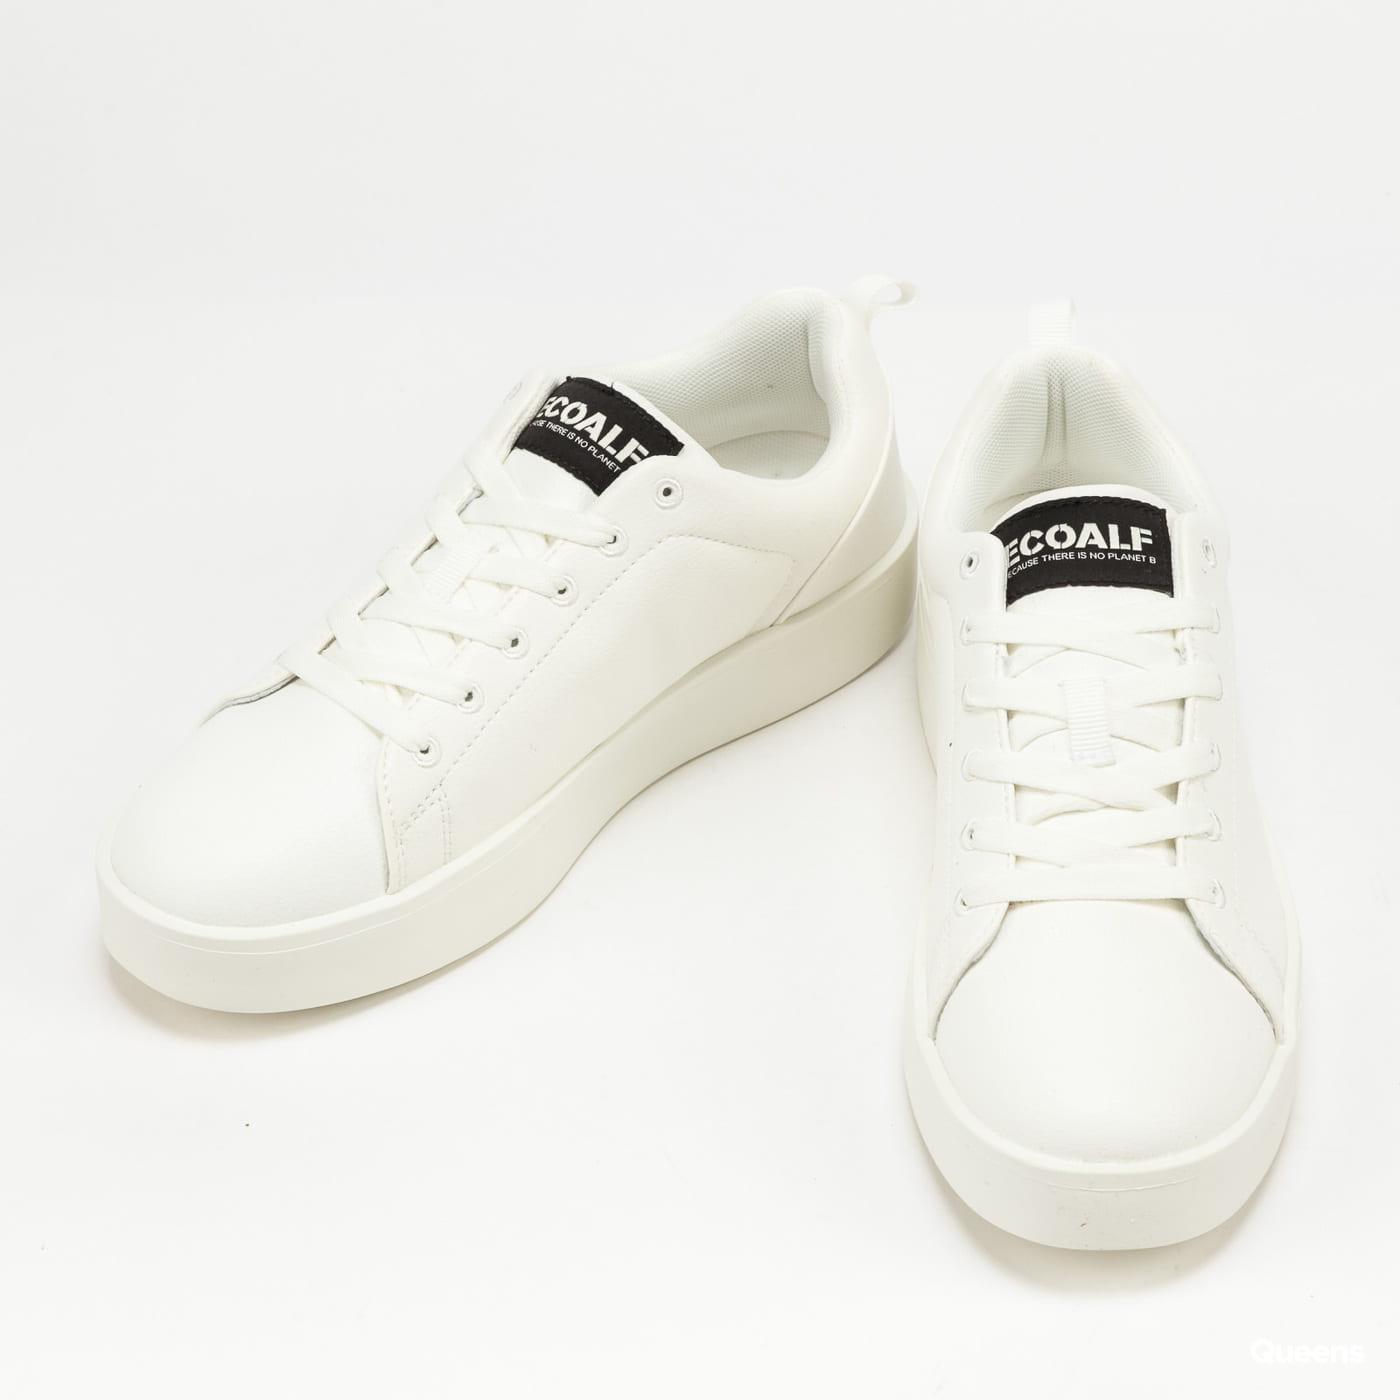 Ecoalf W Elioalf Grape Sneakers off white